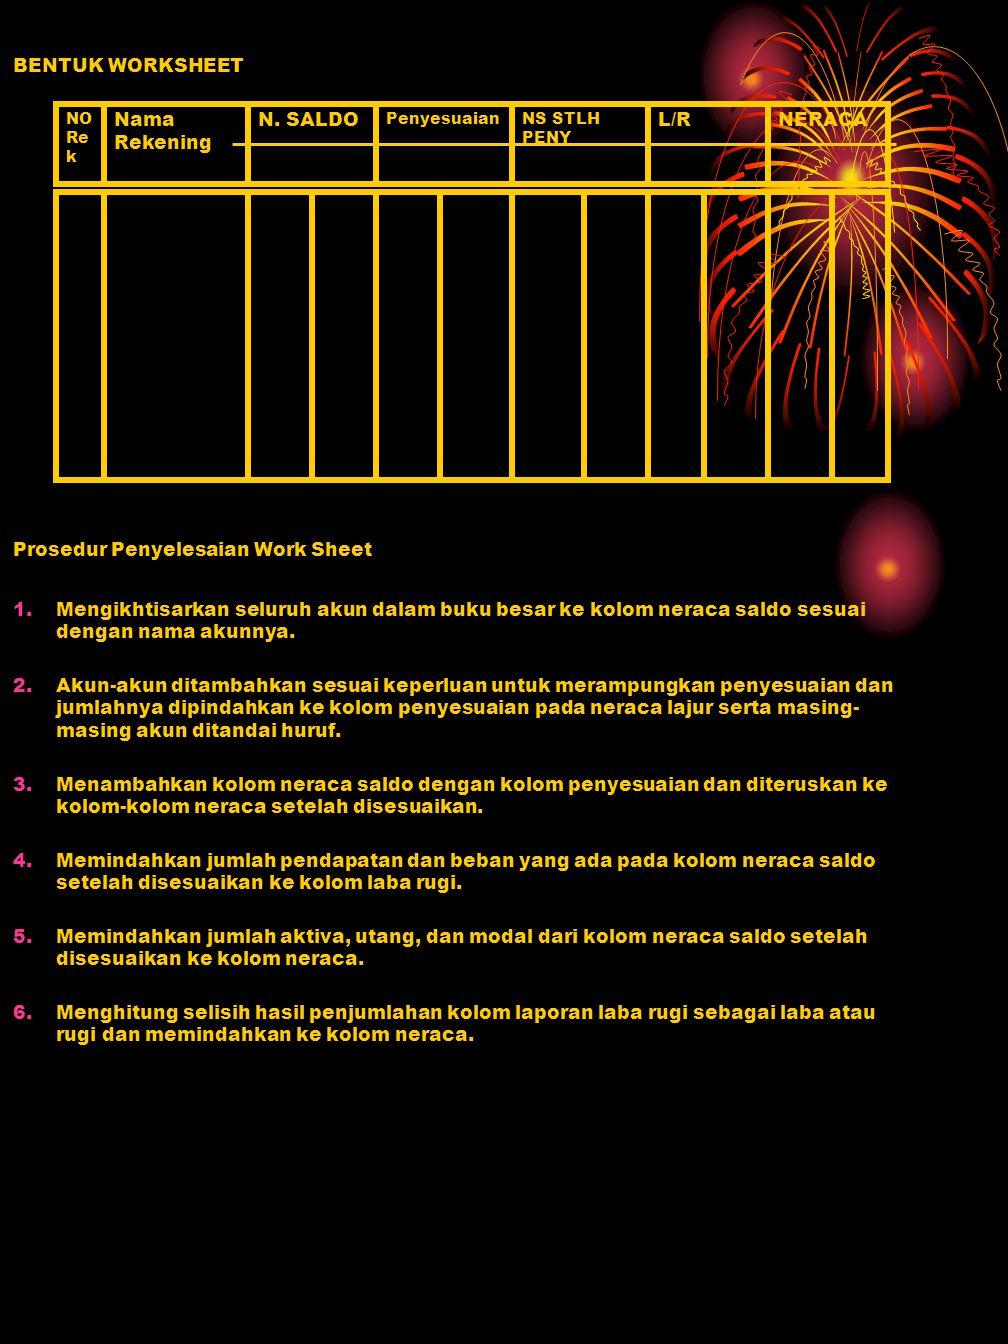 Prosedur Penyelesaian Work Sheet